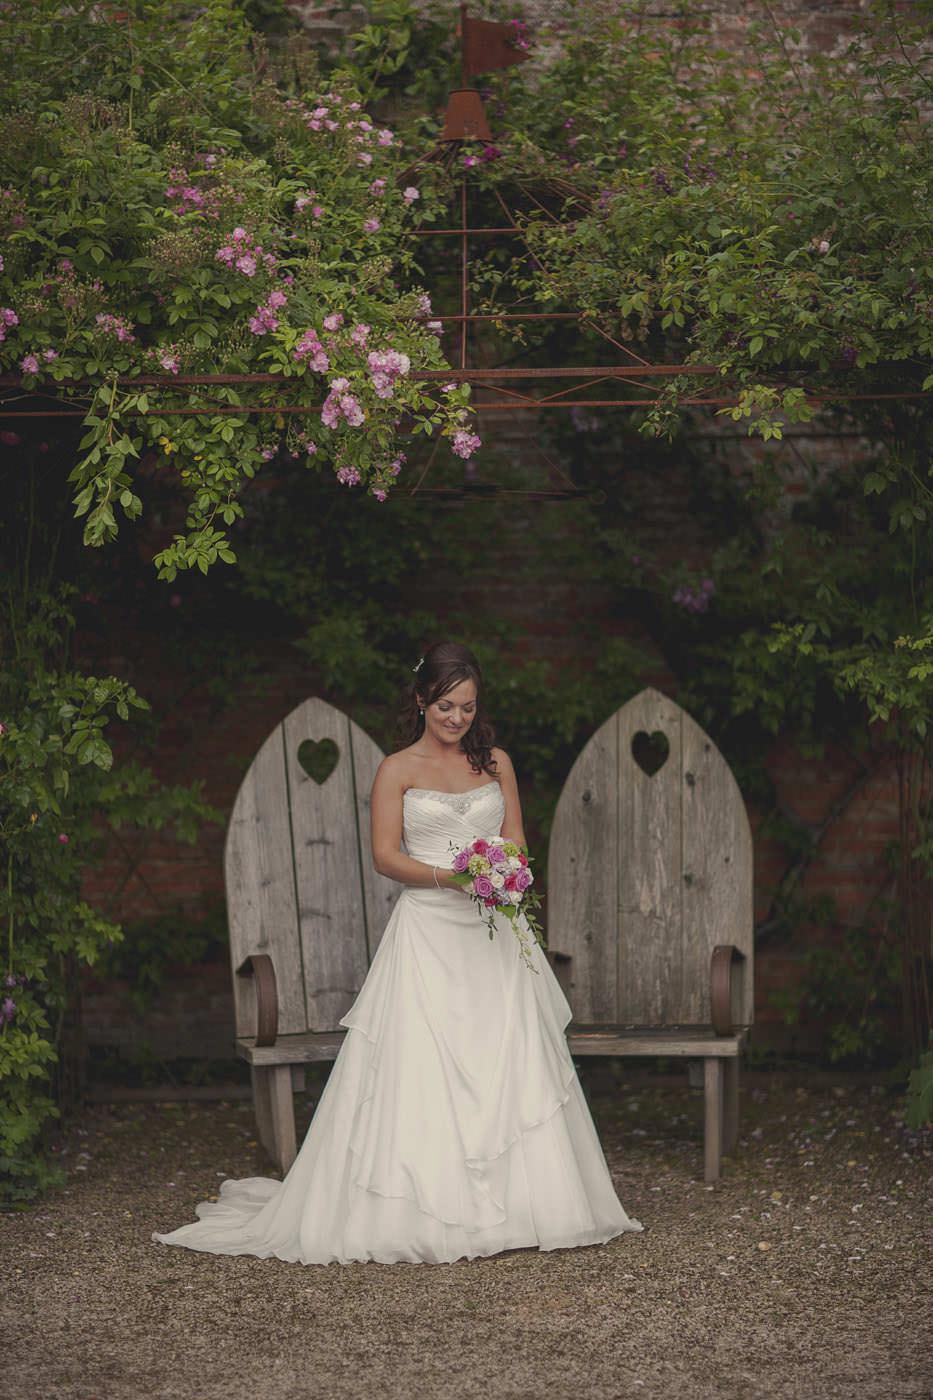 chrissarah walled garden midhurst wedding photographer 0133